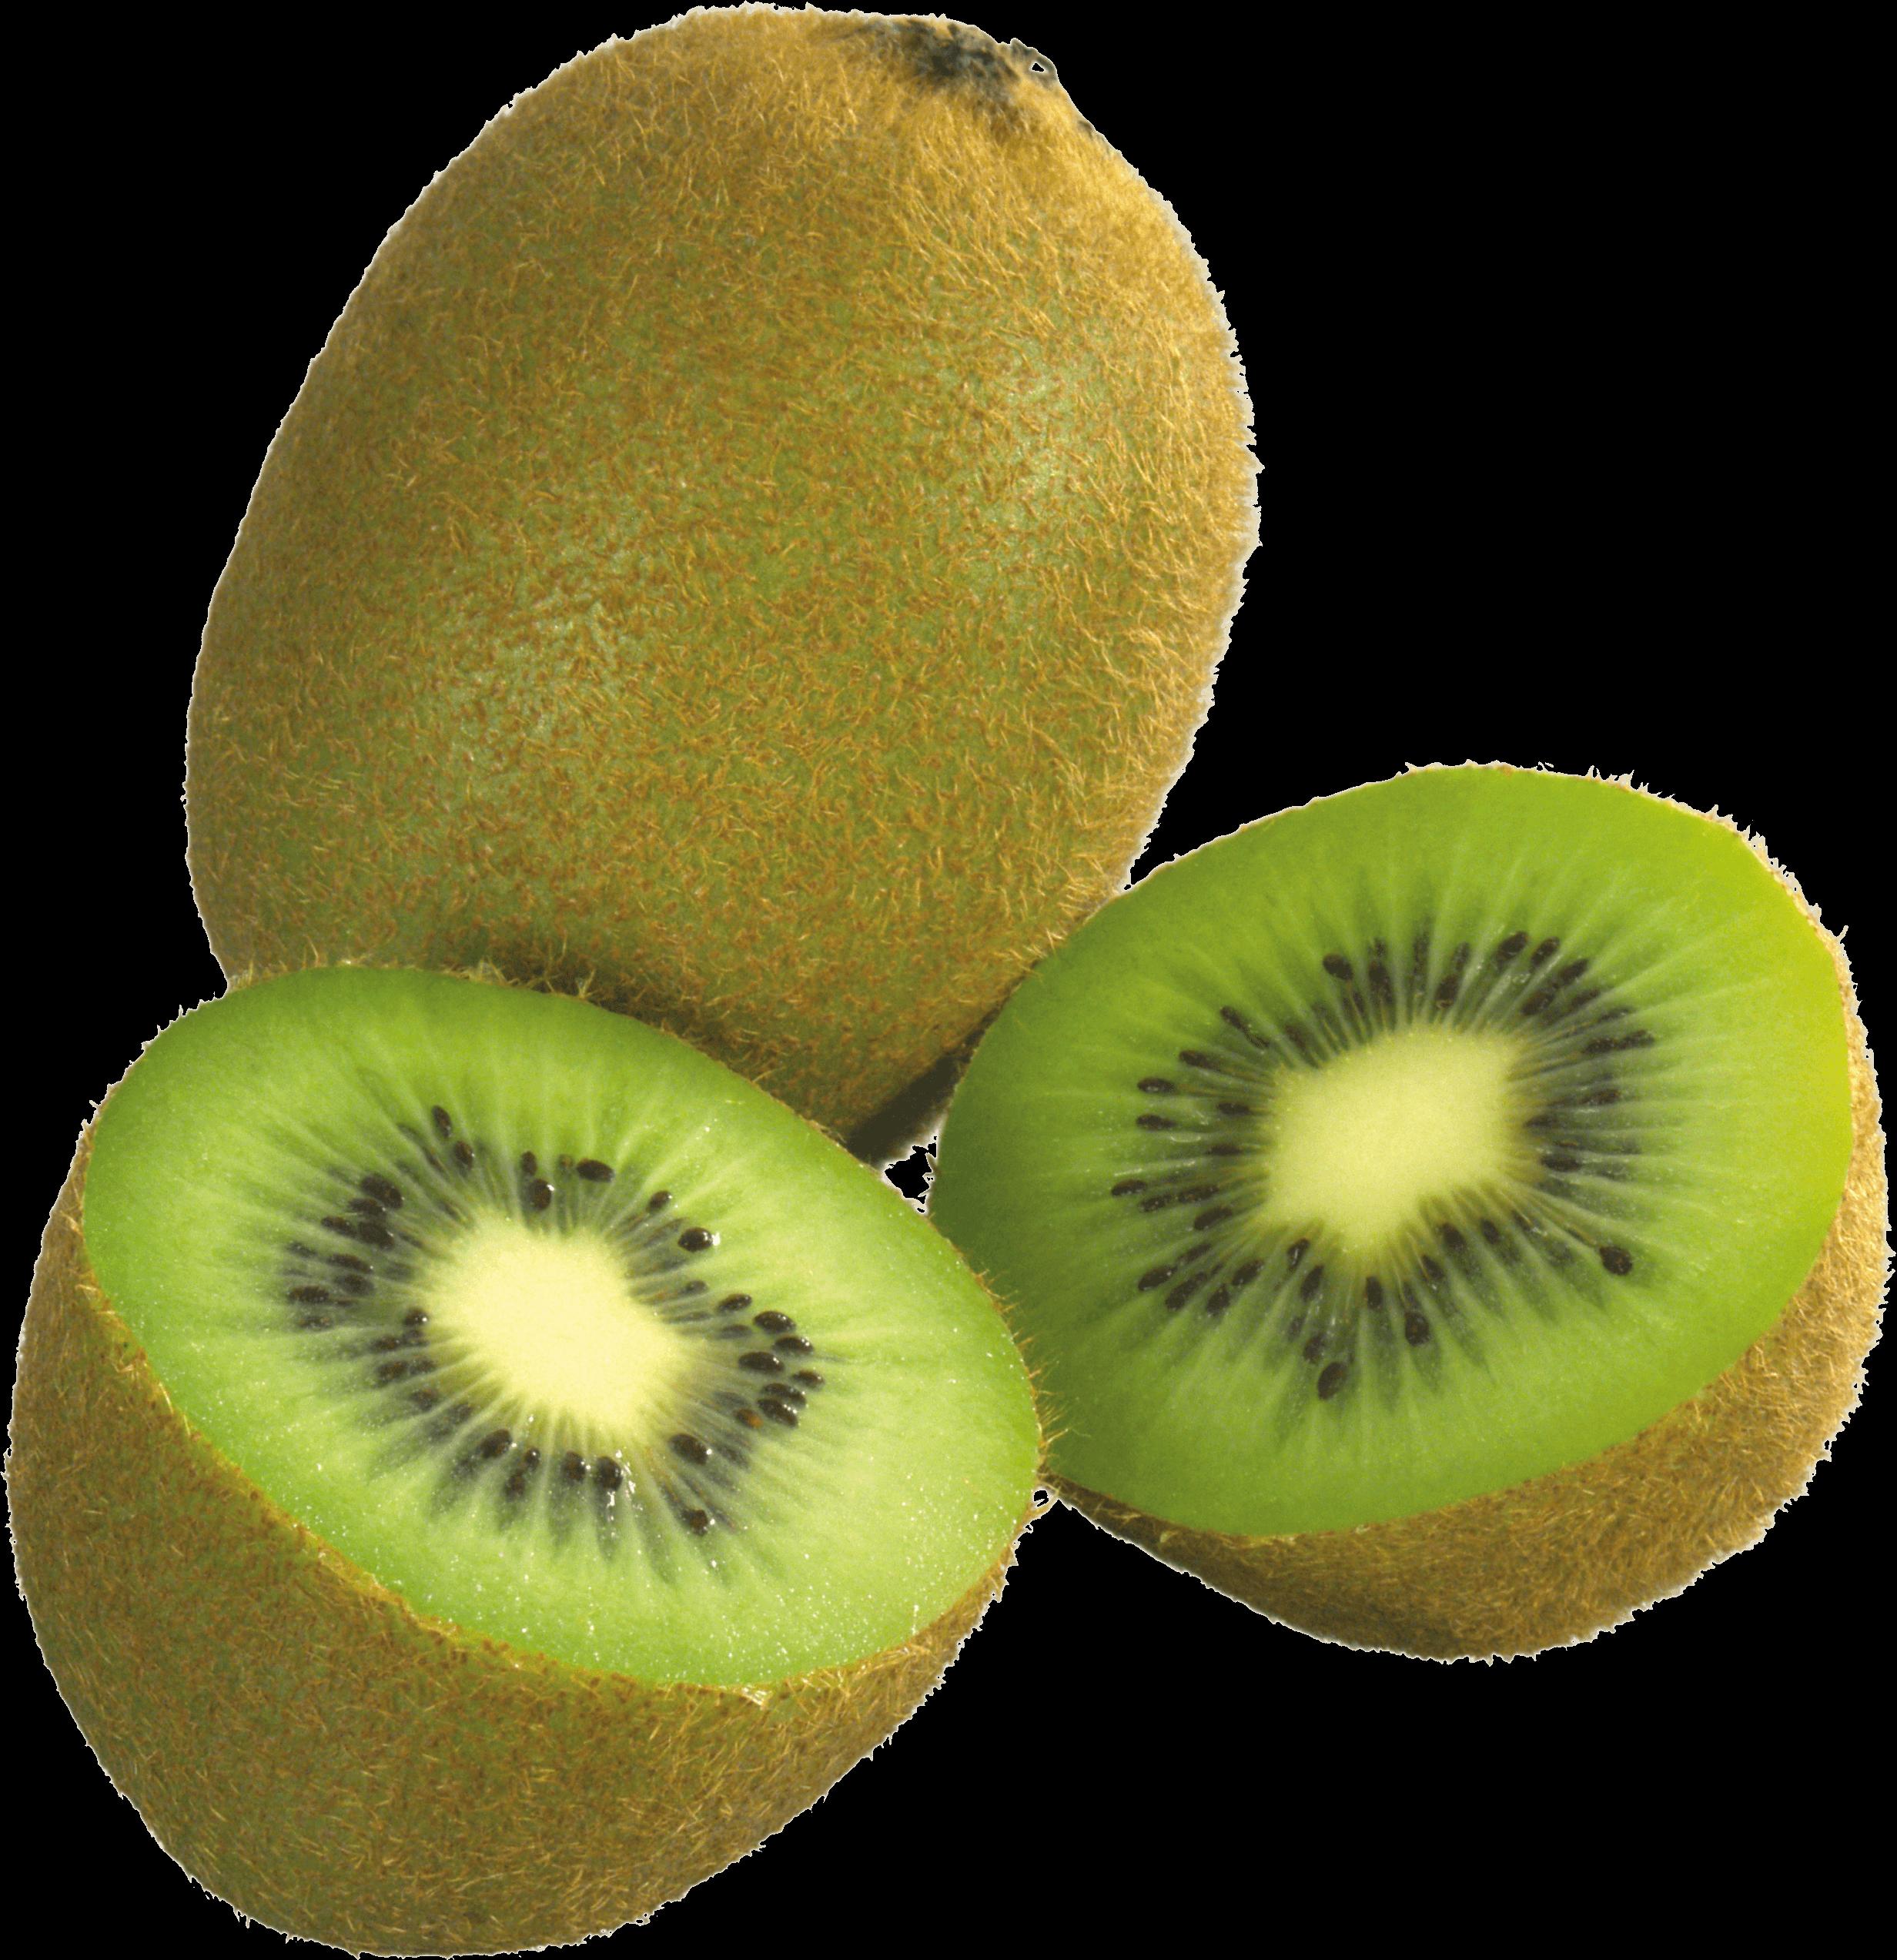 Kiwi clipart kind fruit. Three kiwis transparent png